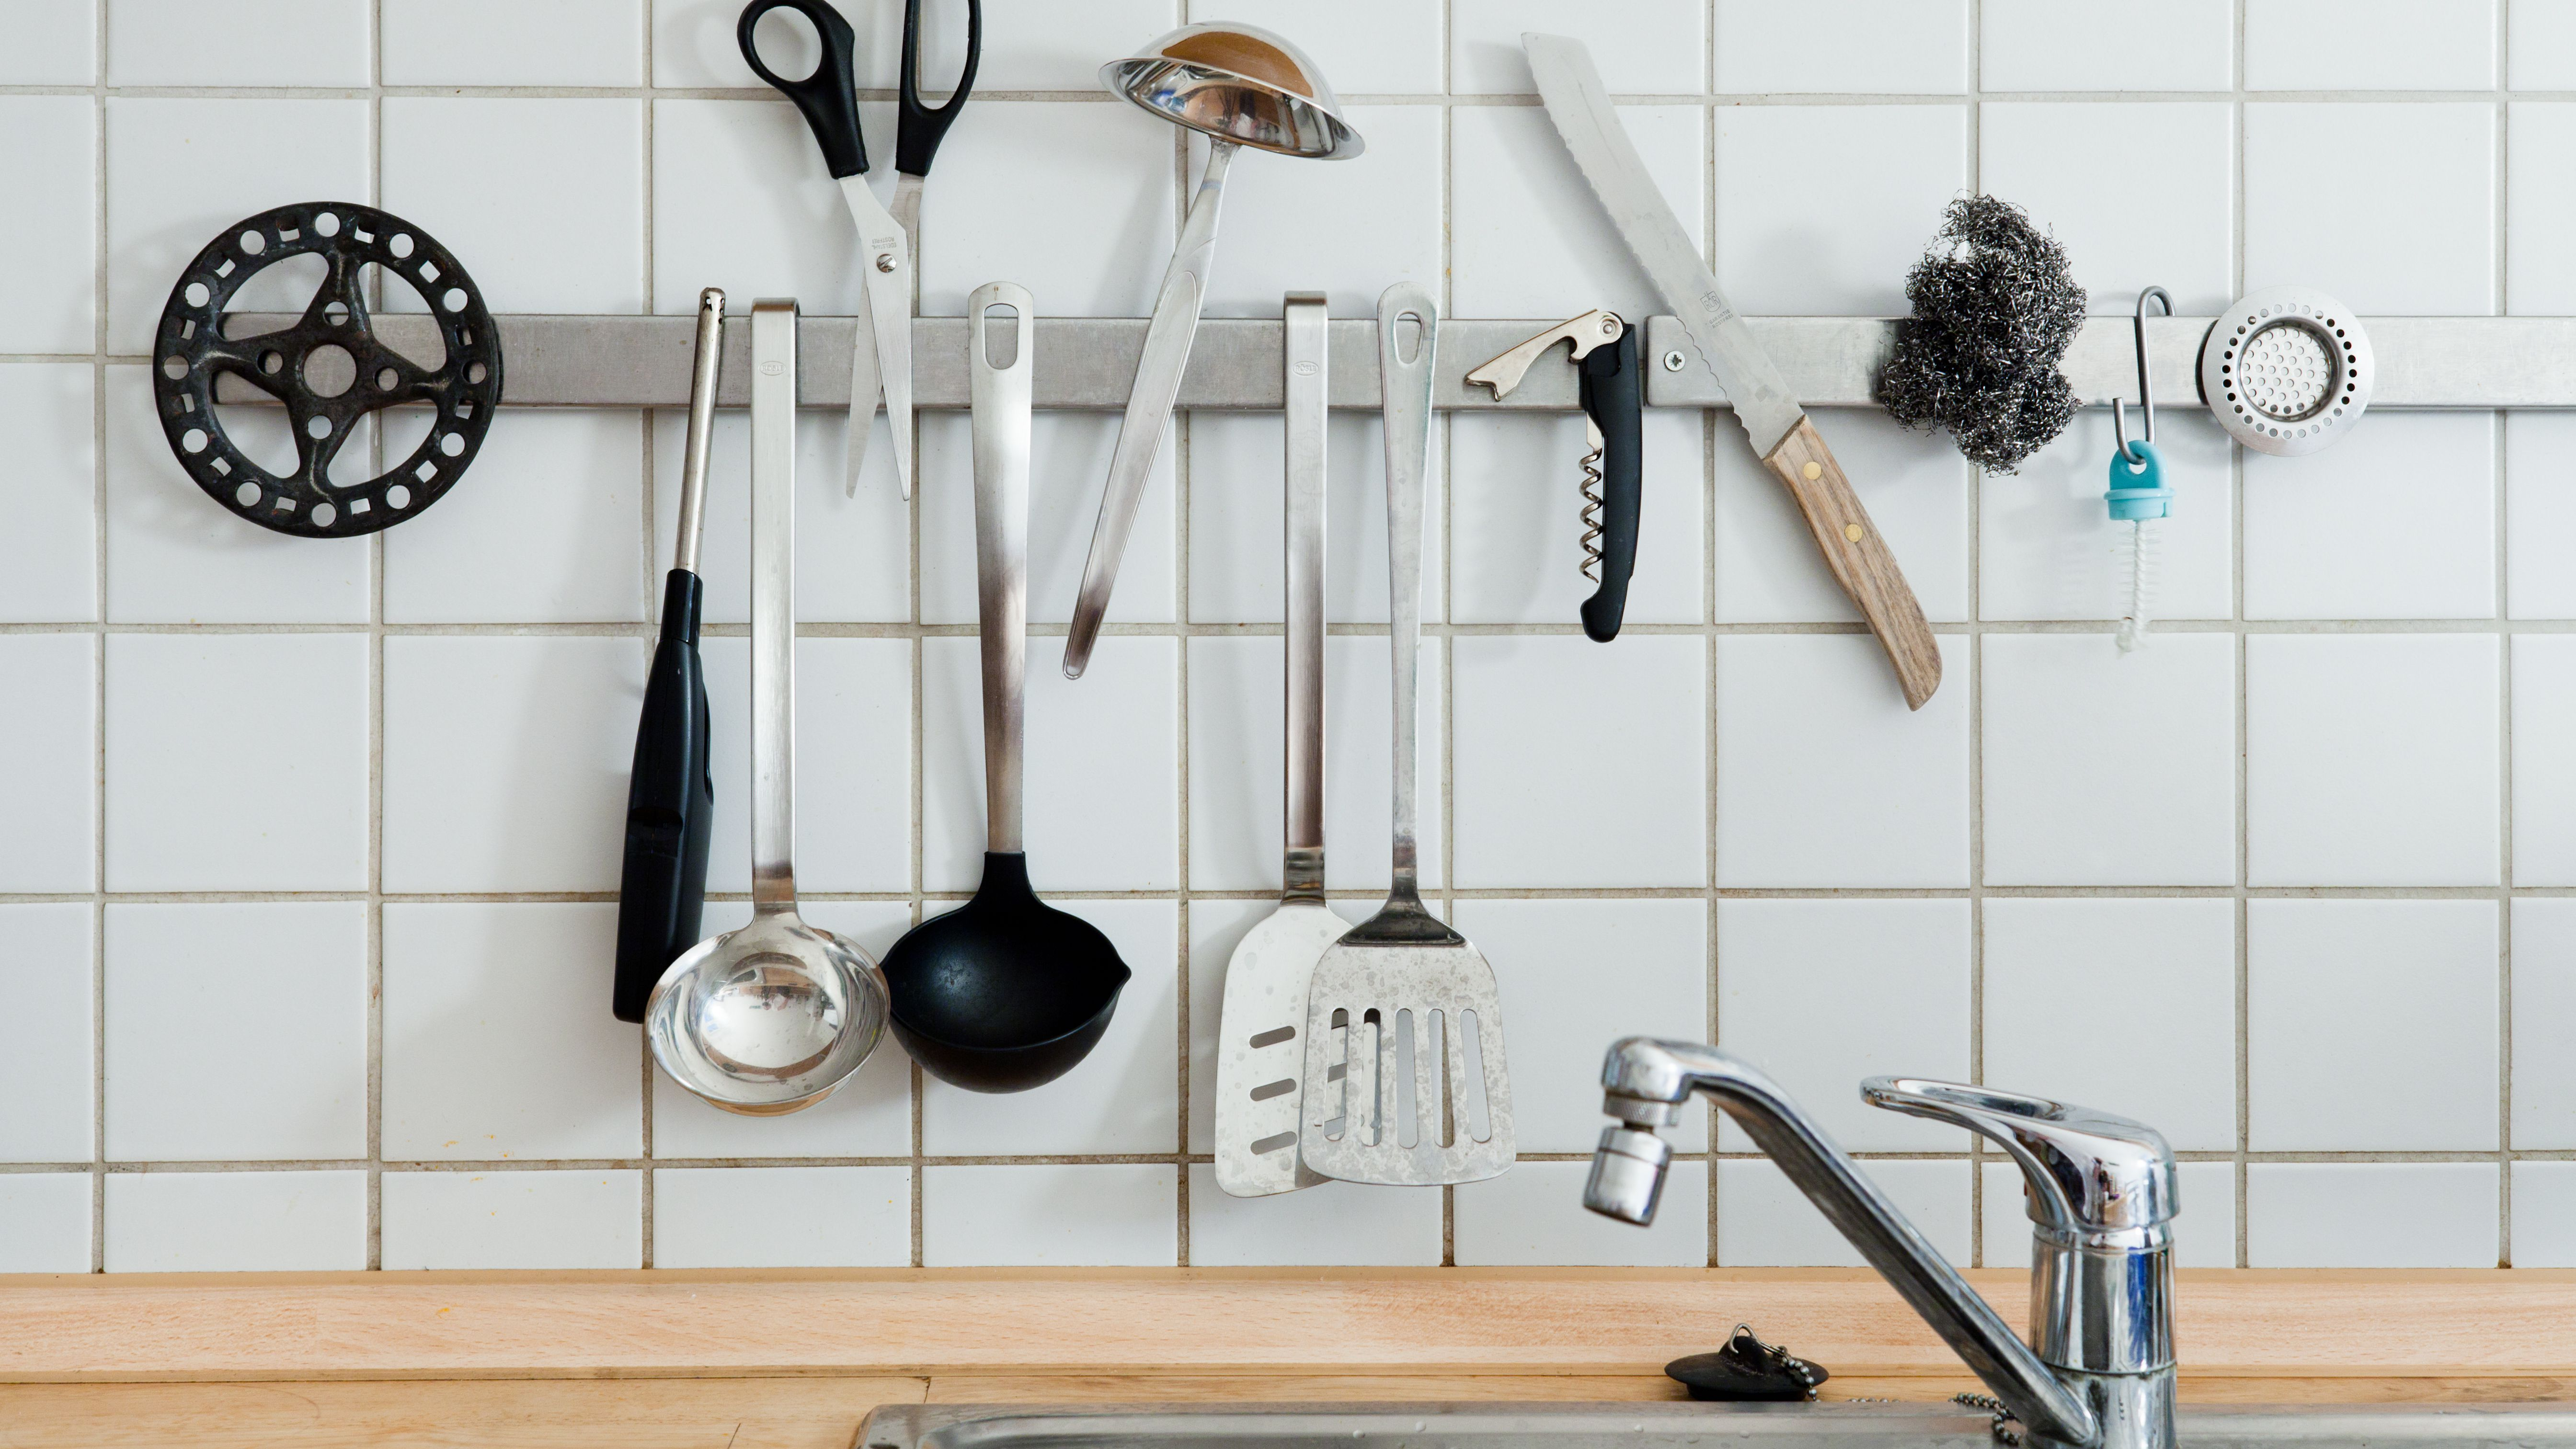 Superb The 19 Best Cooking Utensils Of 2019 Home Interior And Landscaping Oversignezvosmurscom